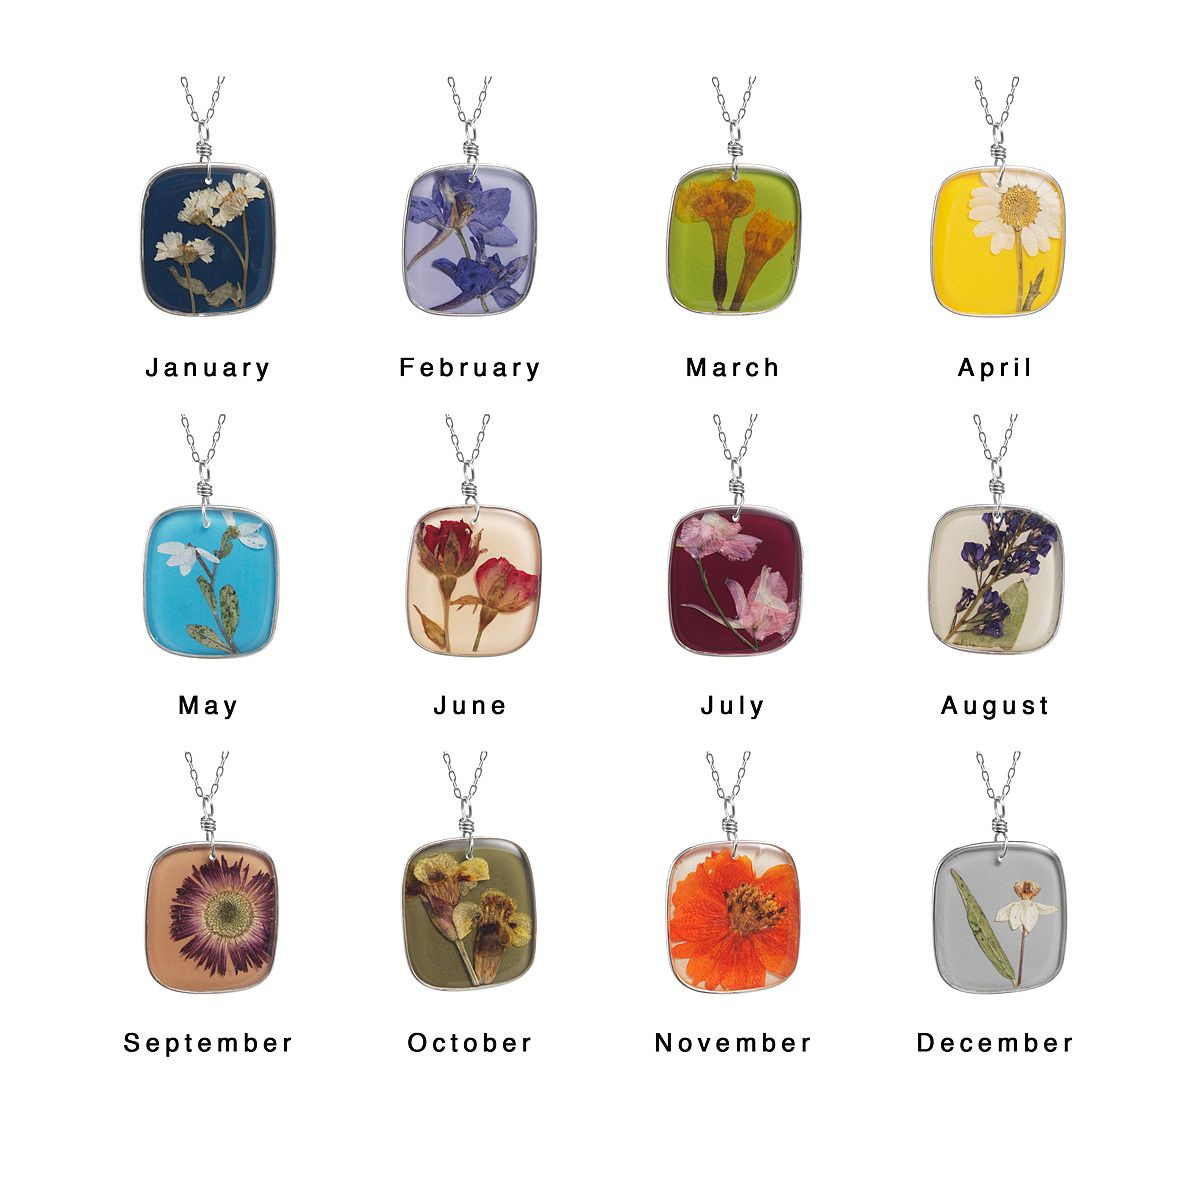 Birth month flower necklaces birth month flowers month flowers birth month flower necklaces birthday jewelry izmirmasajfo Images